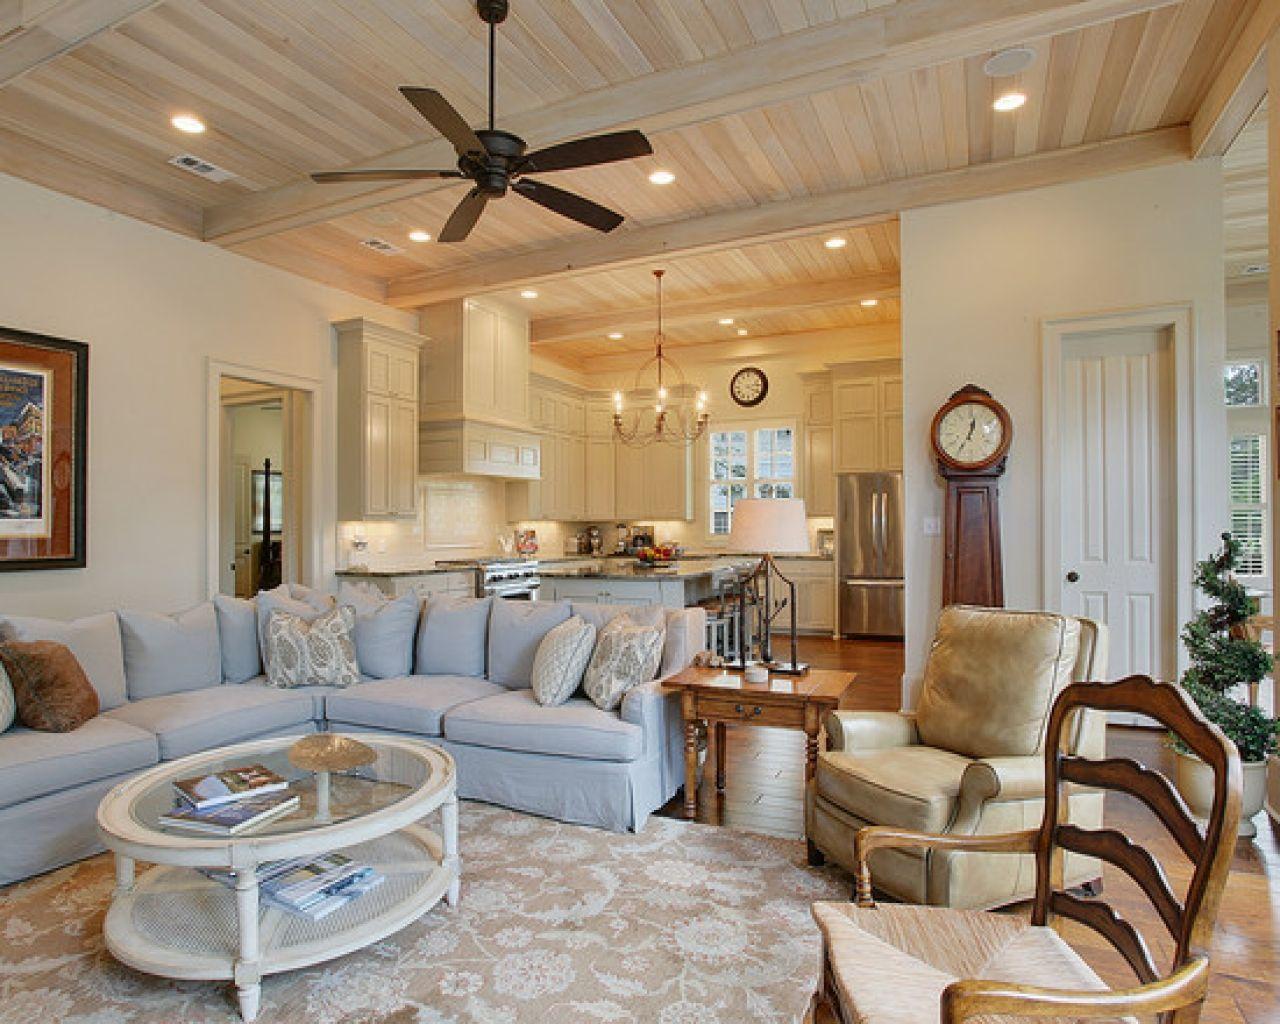 new orleans interior design living room   Home ...